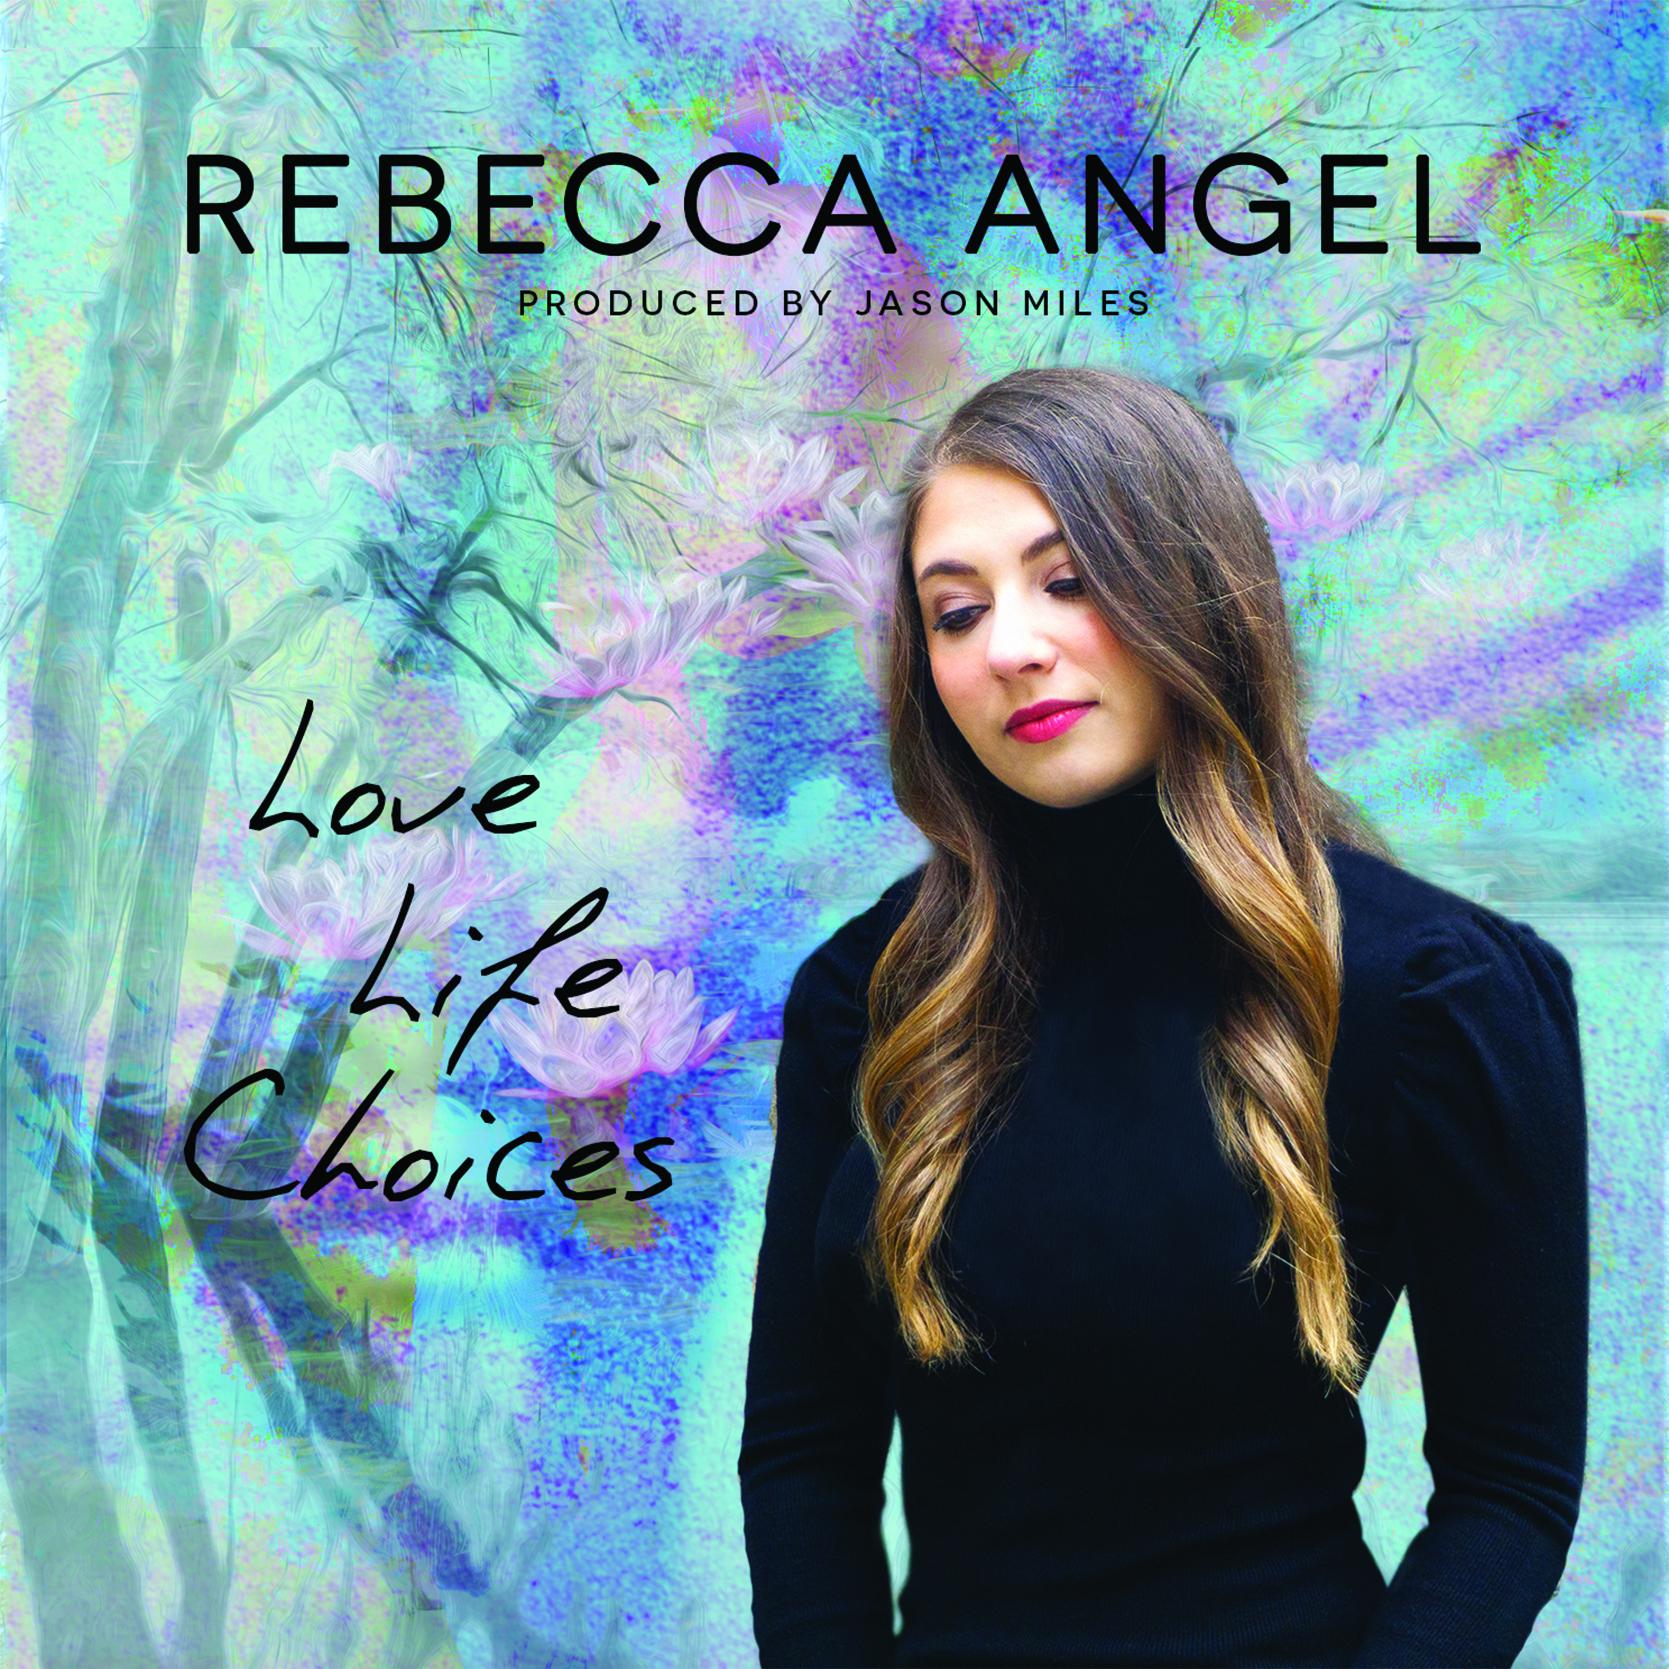 Rebecca Angel's new album Love, Life, Choices